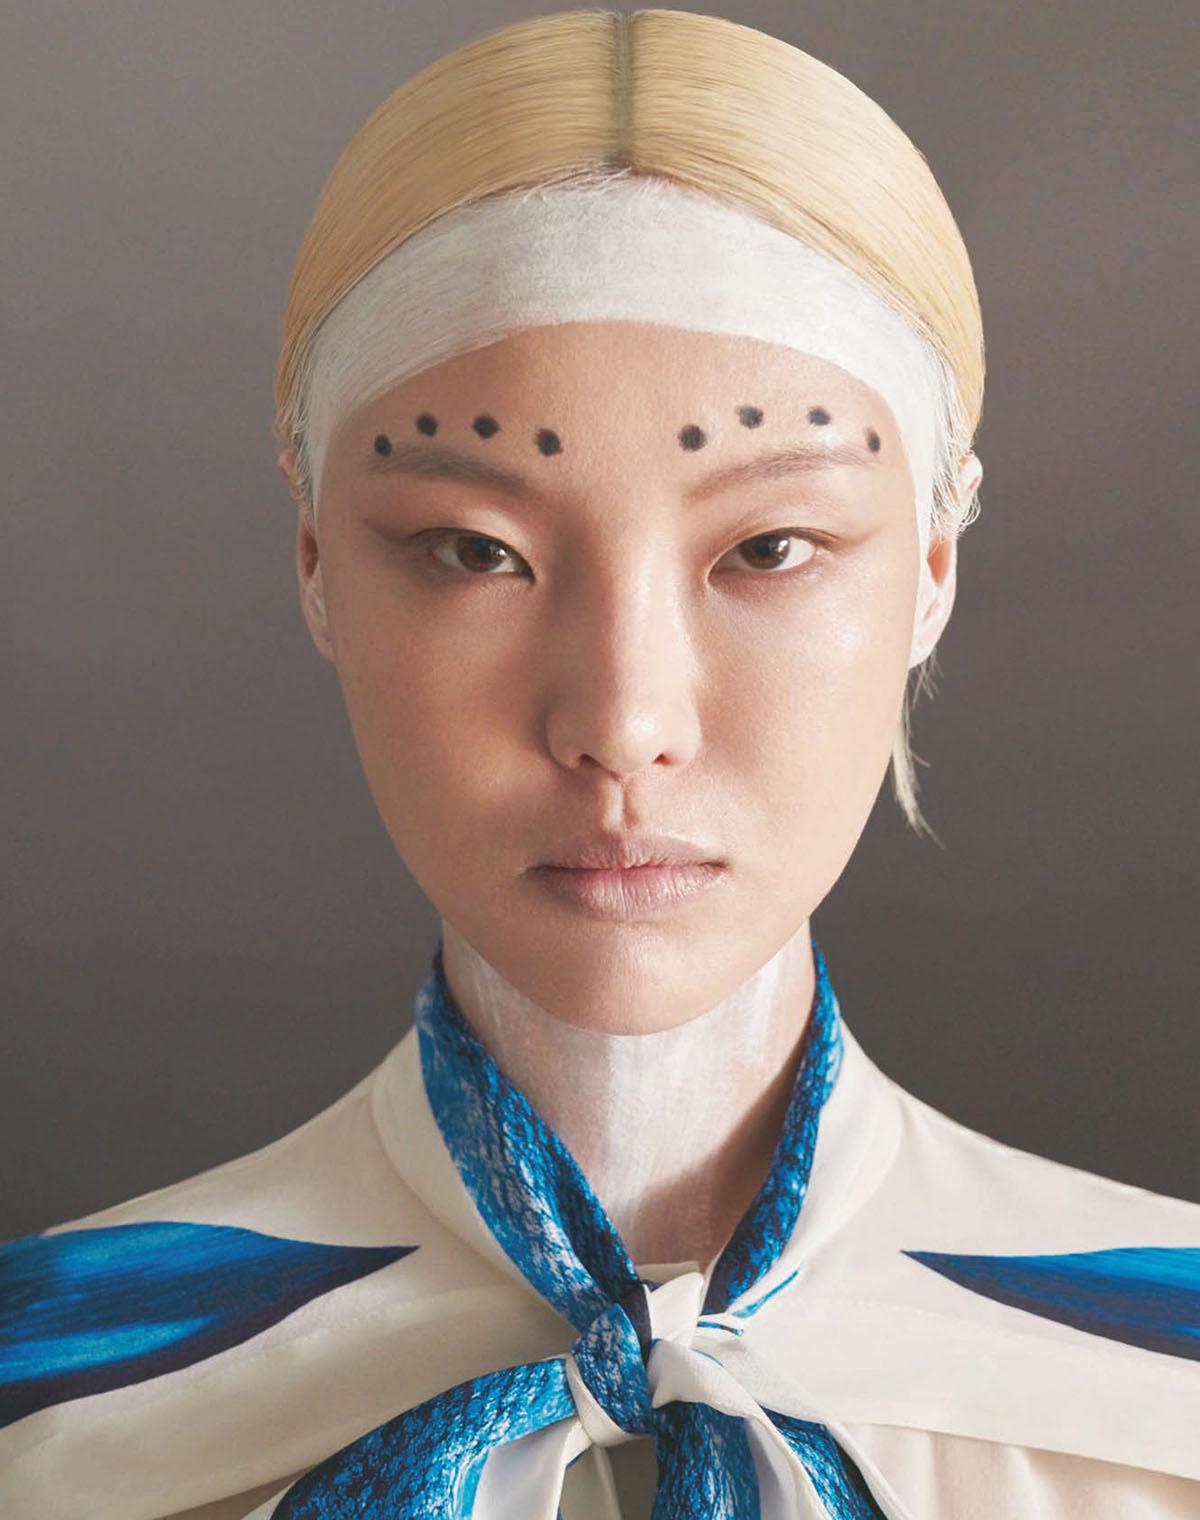 Gia Tang by Ming-Shih Chiang for Harper's Bazaar Taiwan May 2021